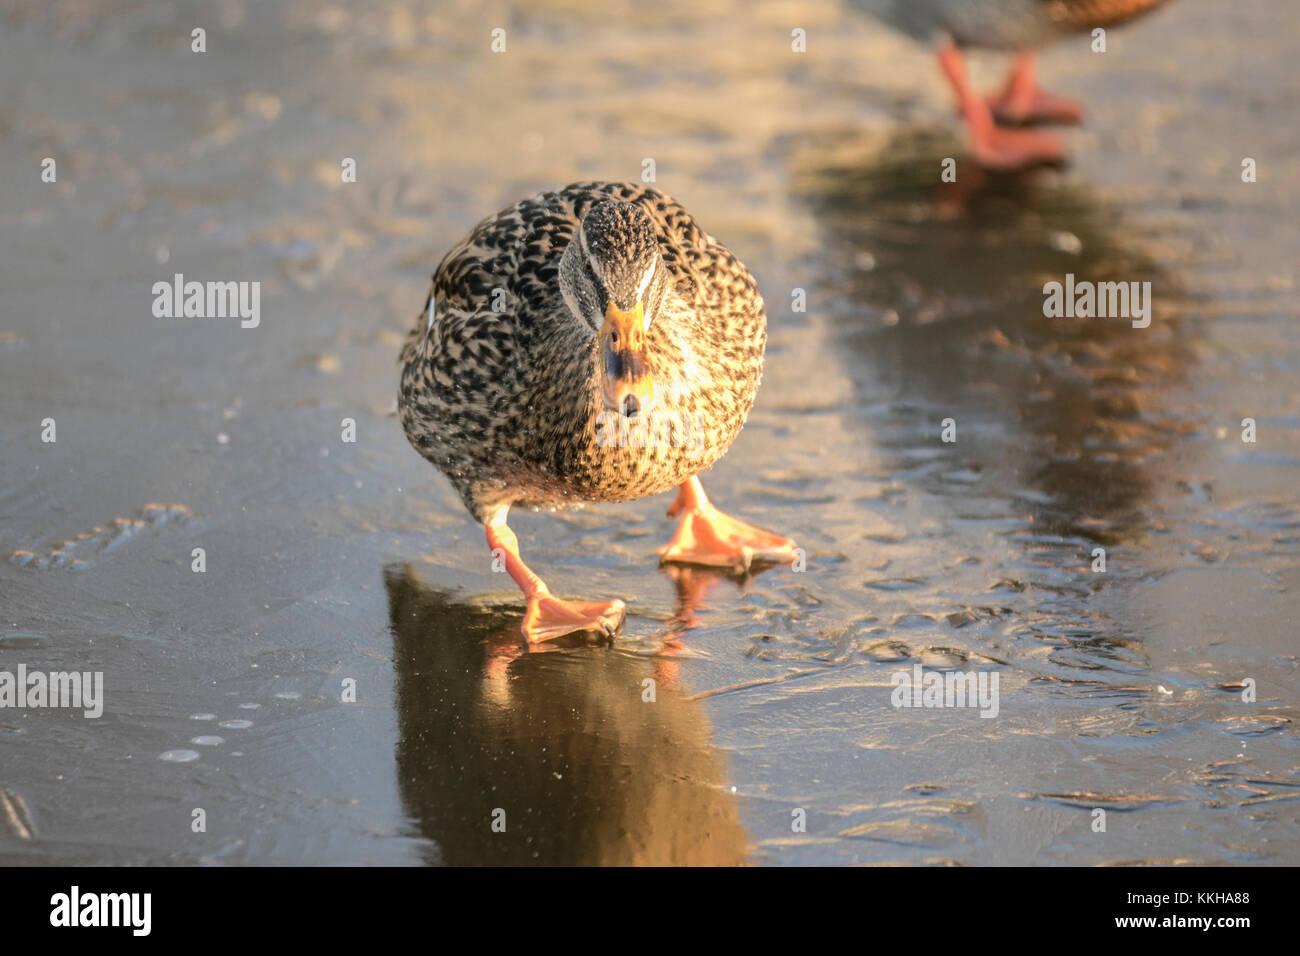 Burscough, Lancashire, UK. 1st December, 2017. UK Weather. Wild and captive ducks struggle for food on a frozen - Stock Image